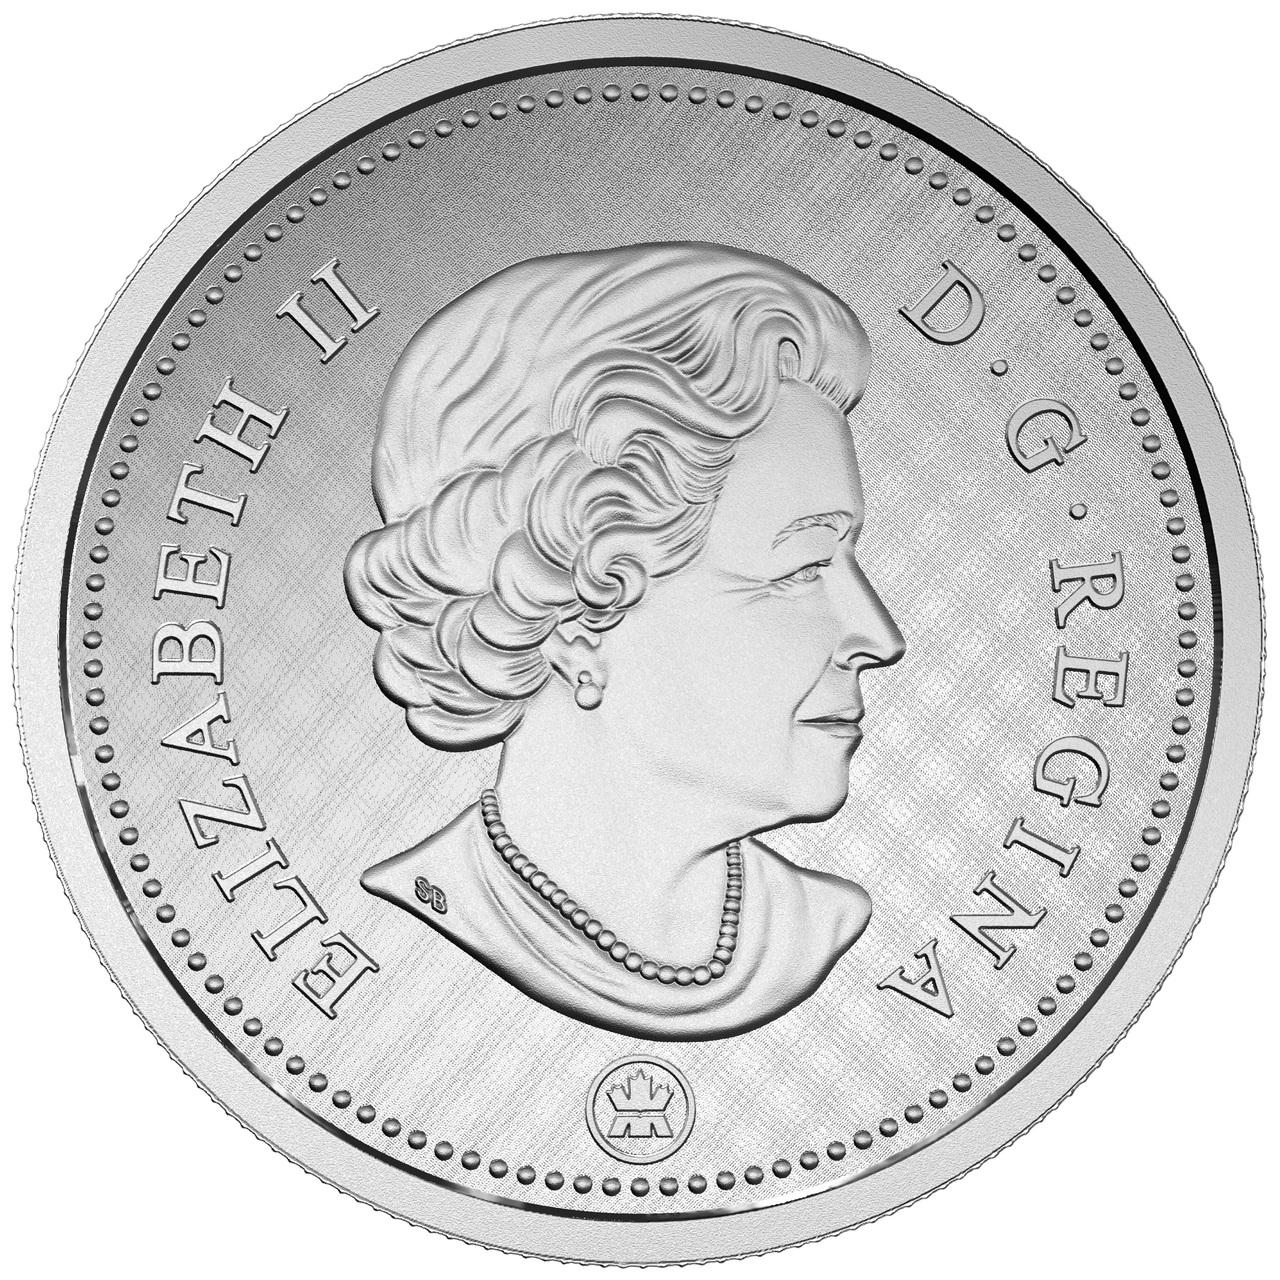 Big Coin Series 25 Cent Coin Quarter